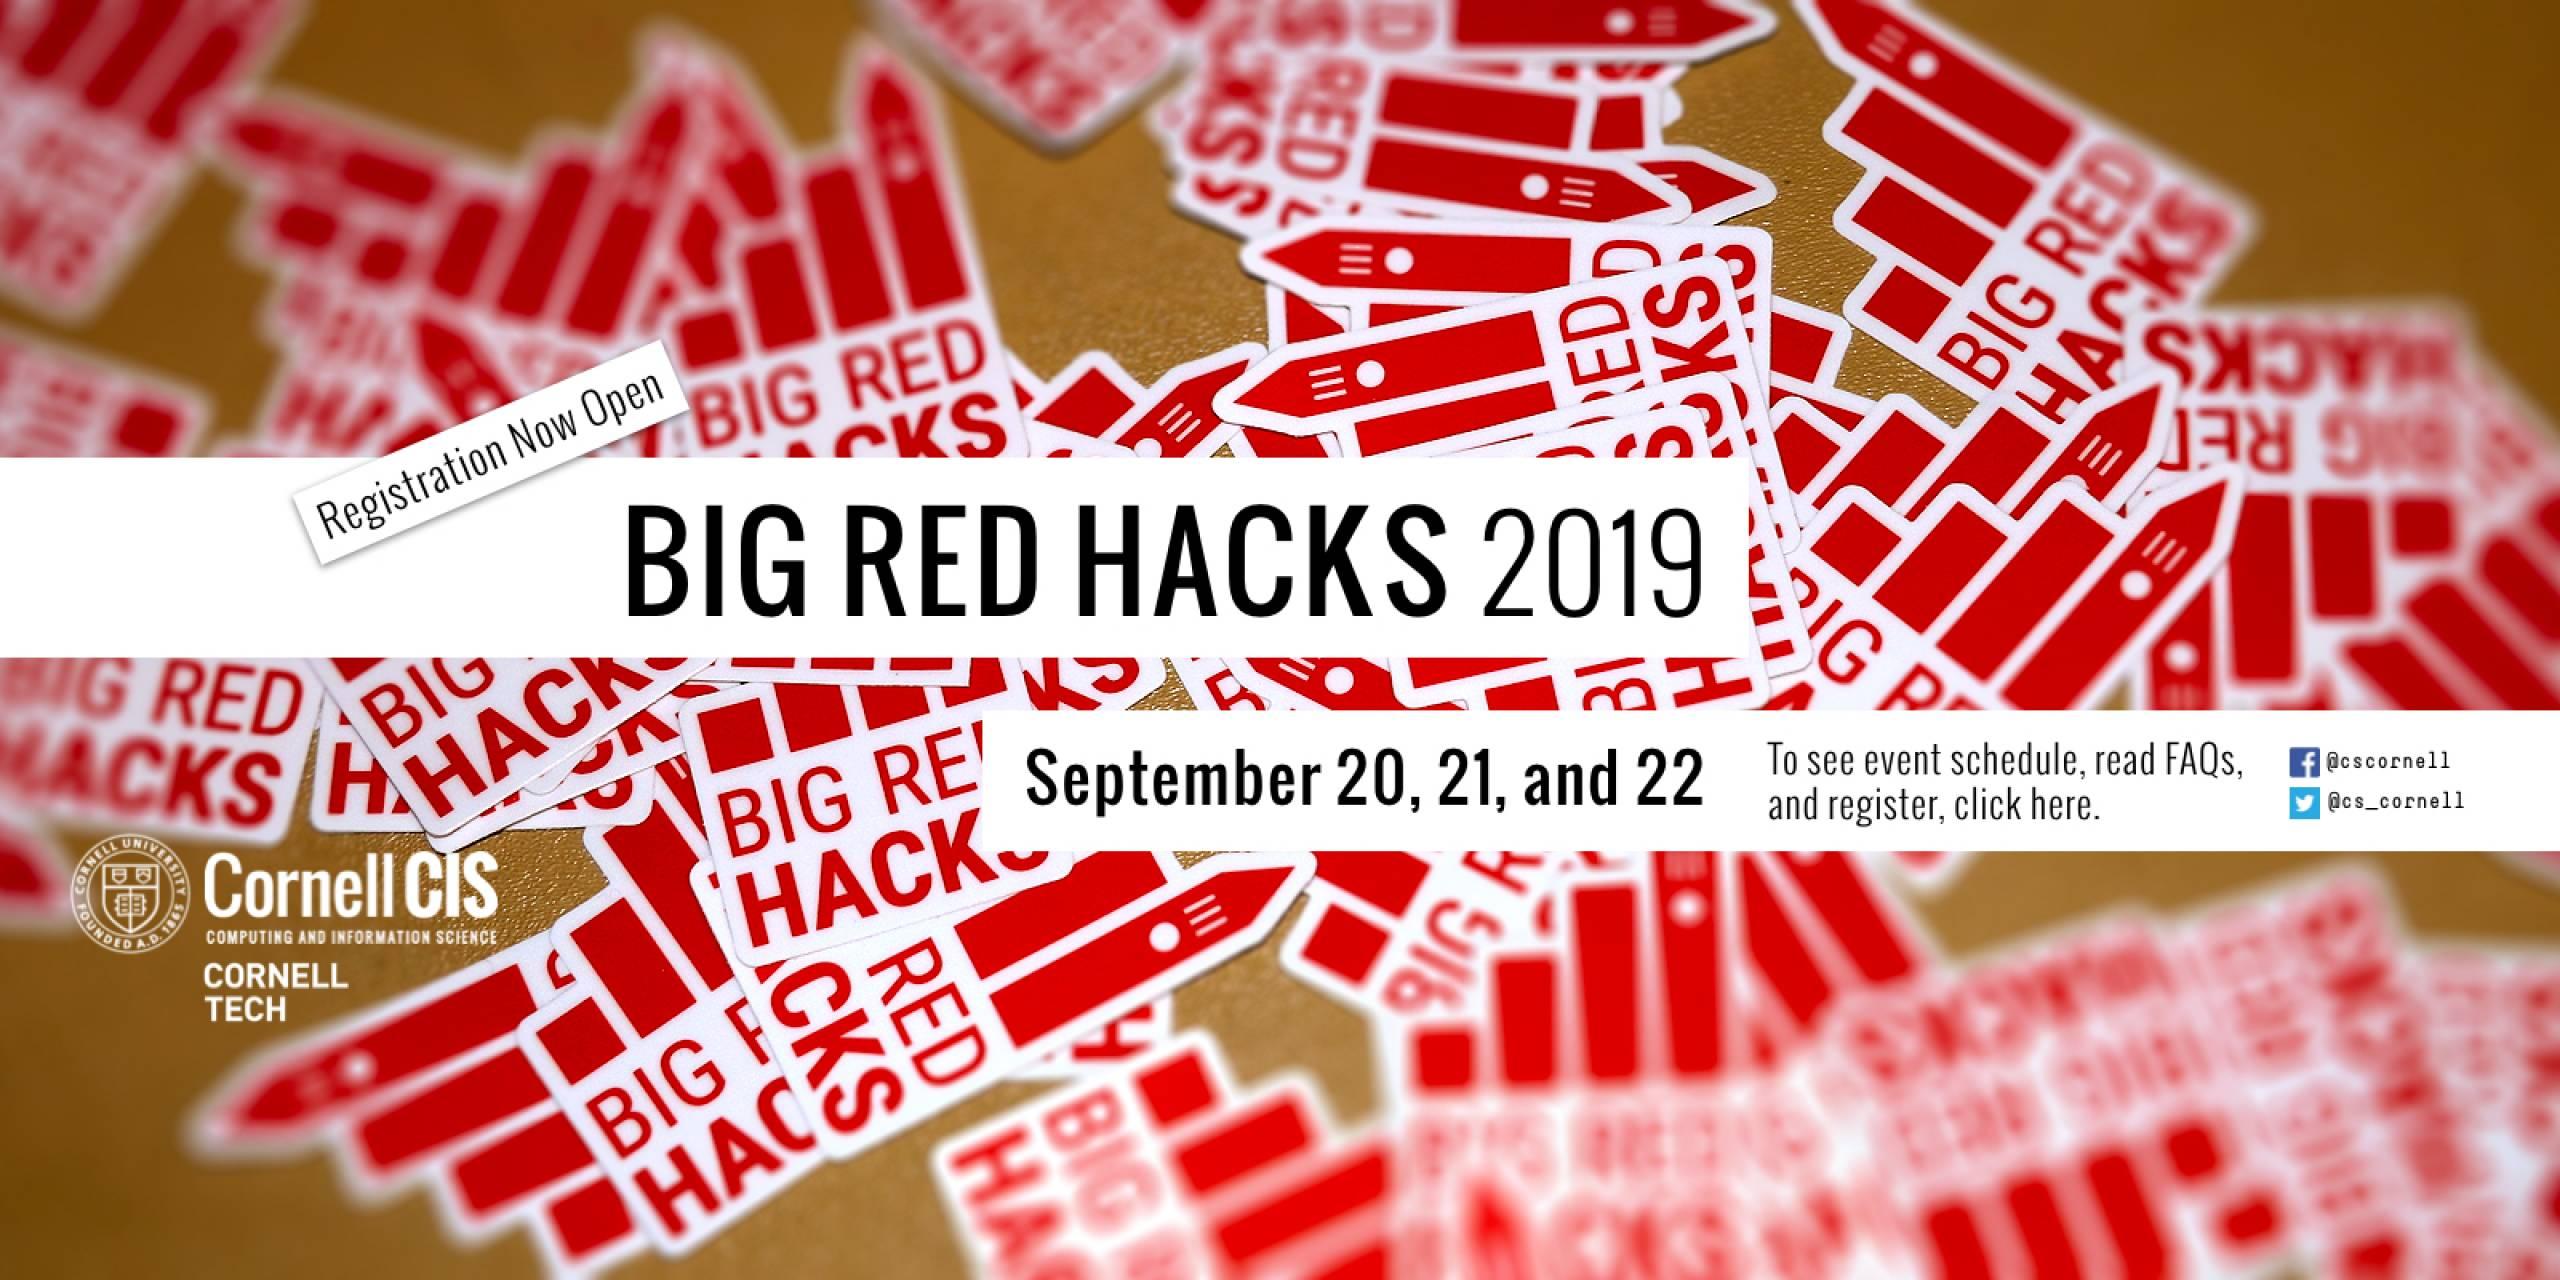 Big Red Hacks 2019